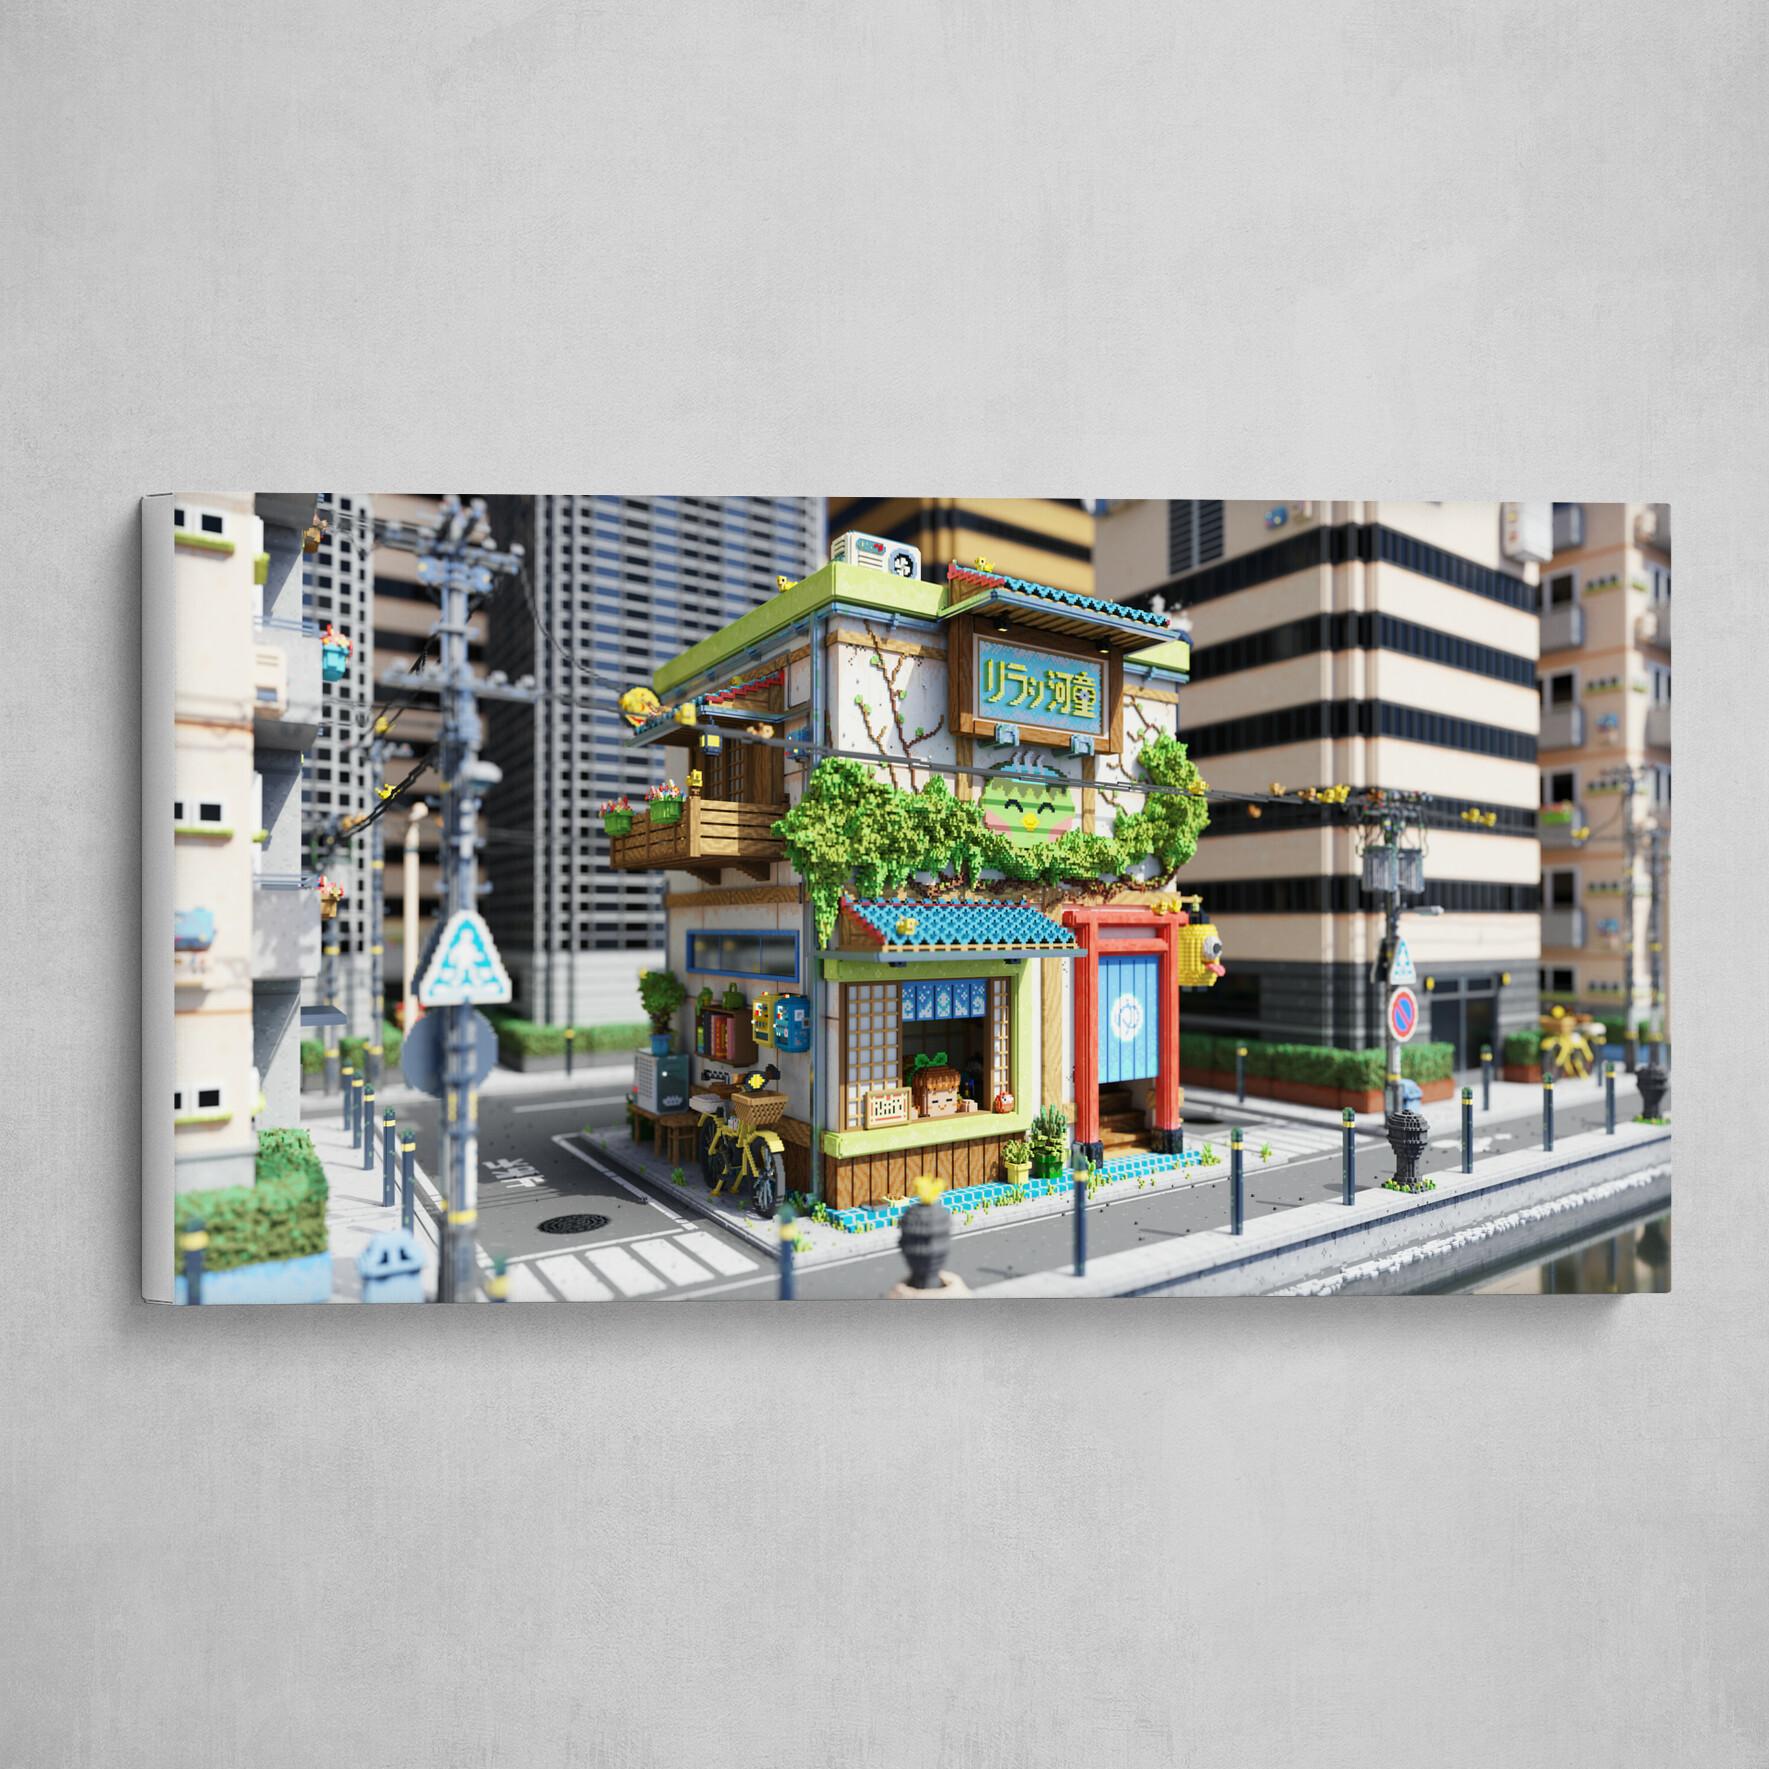 Voxel - Onsen Street - Day 02